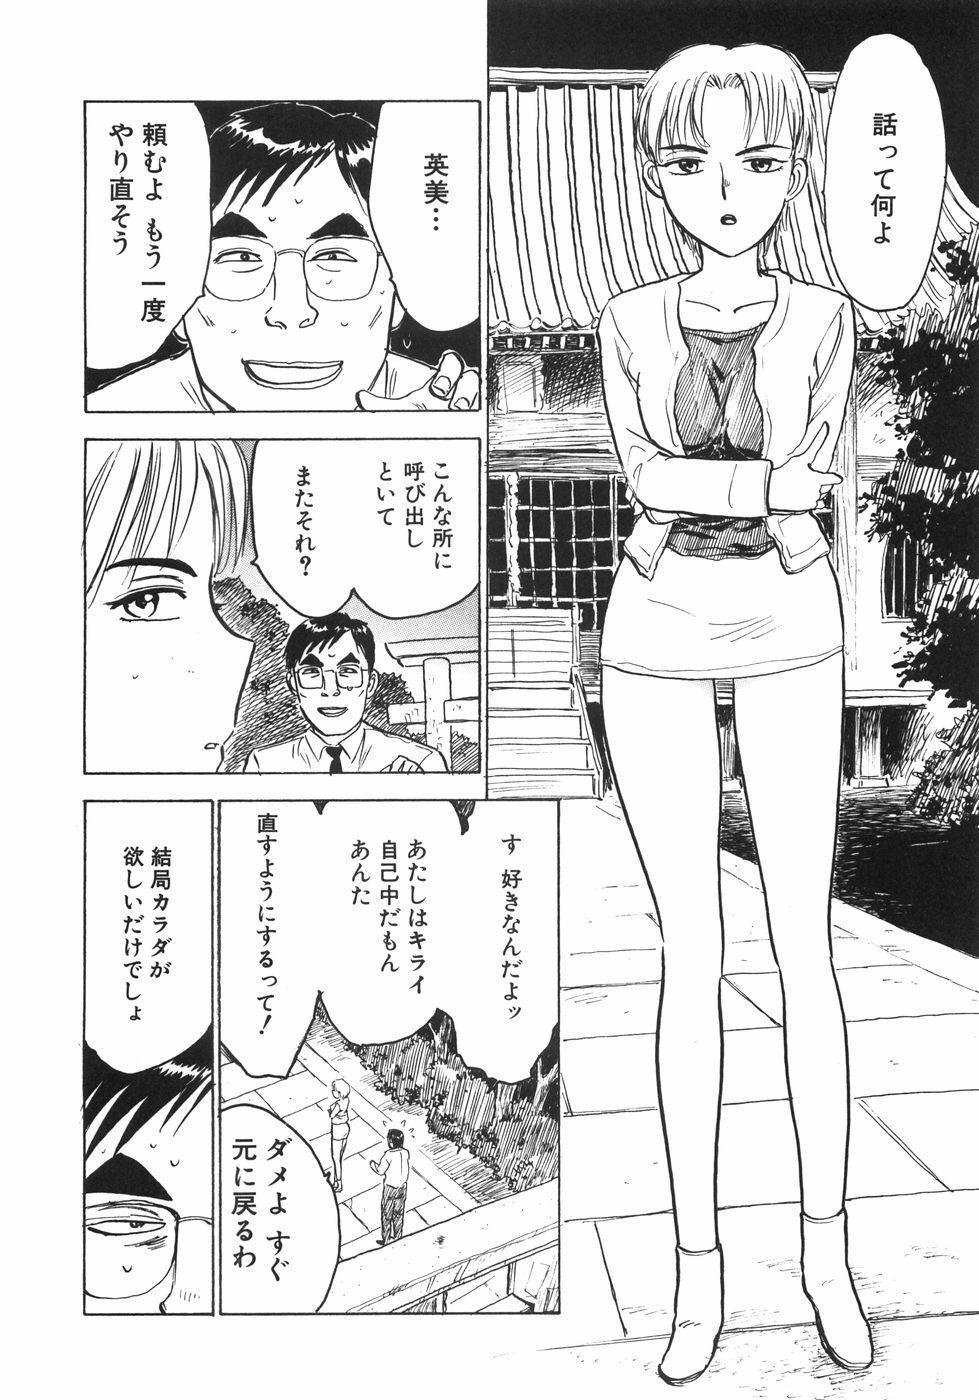 Ningyou no Yakata - The Doll House 42